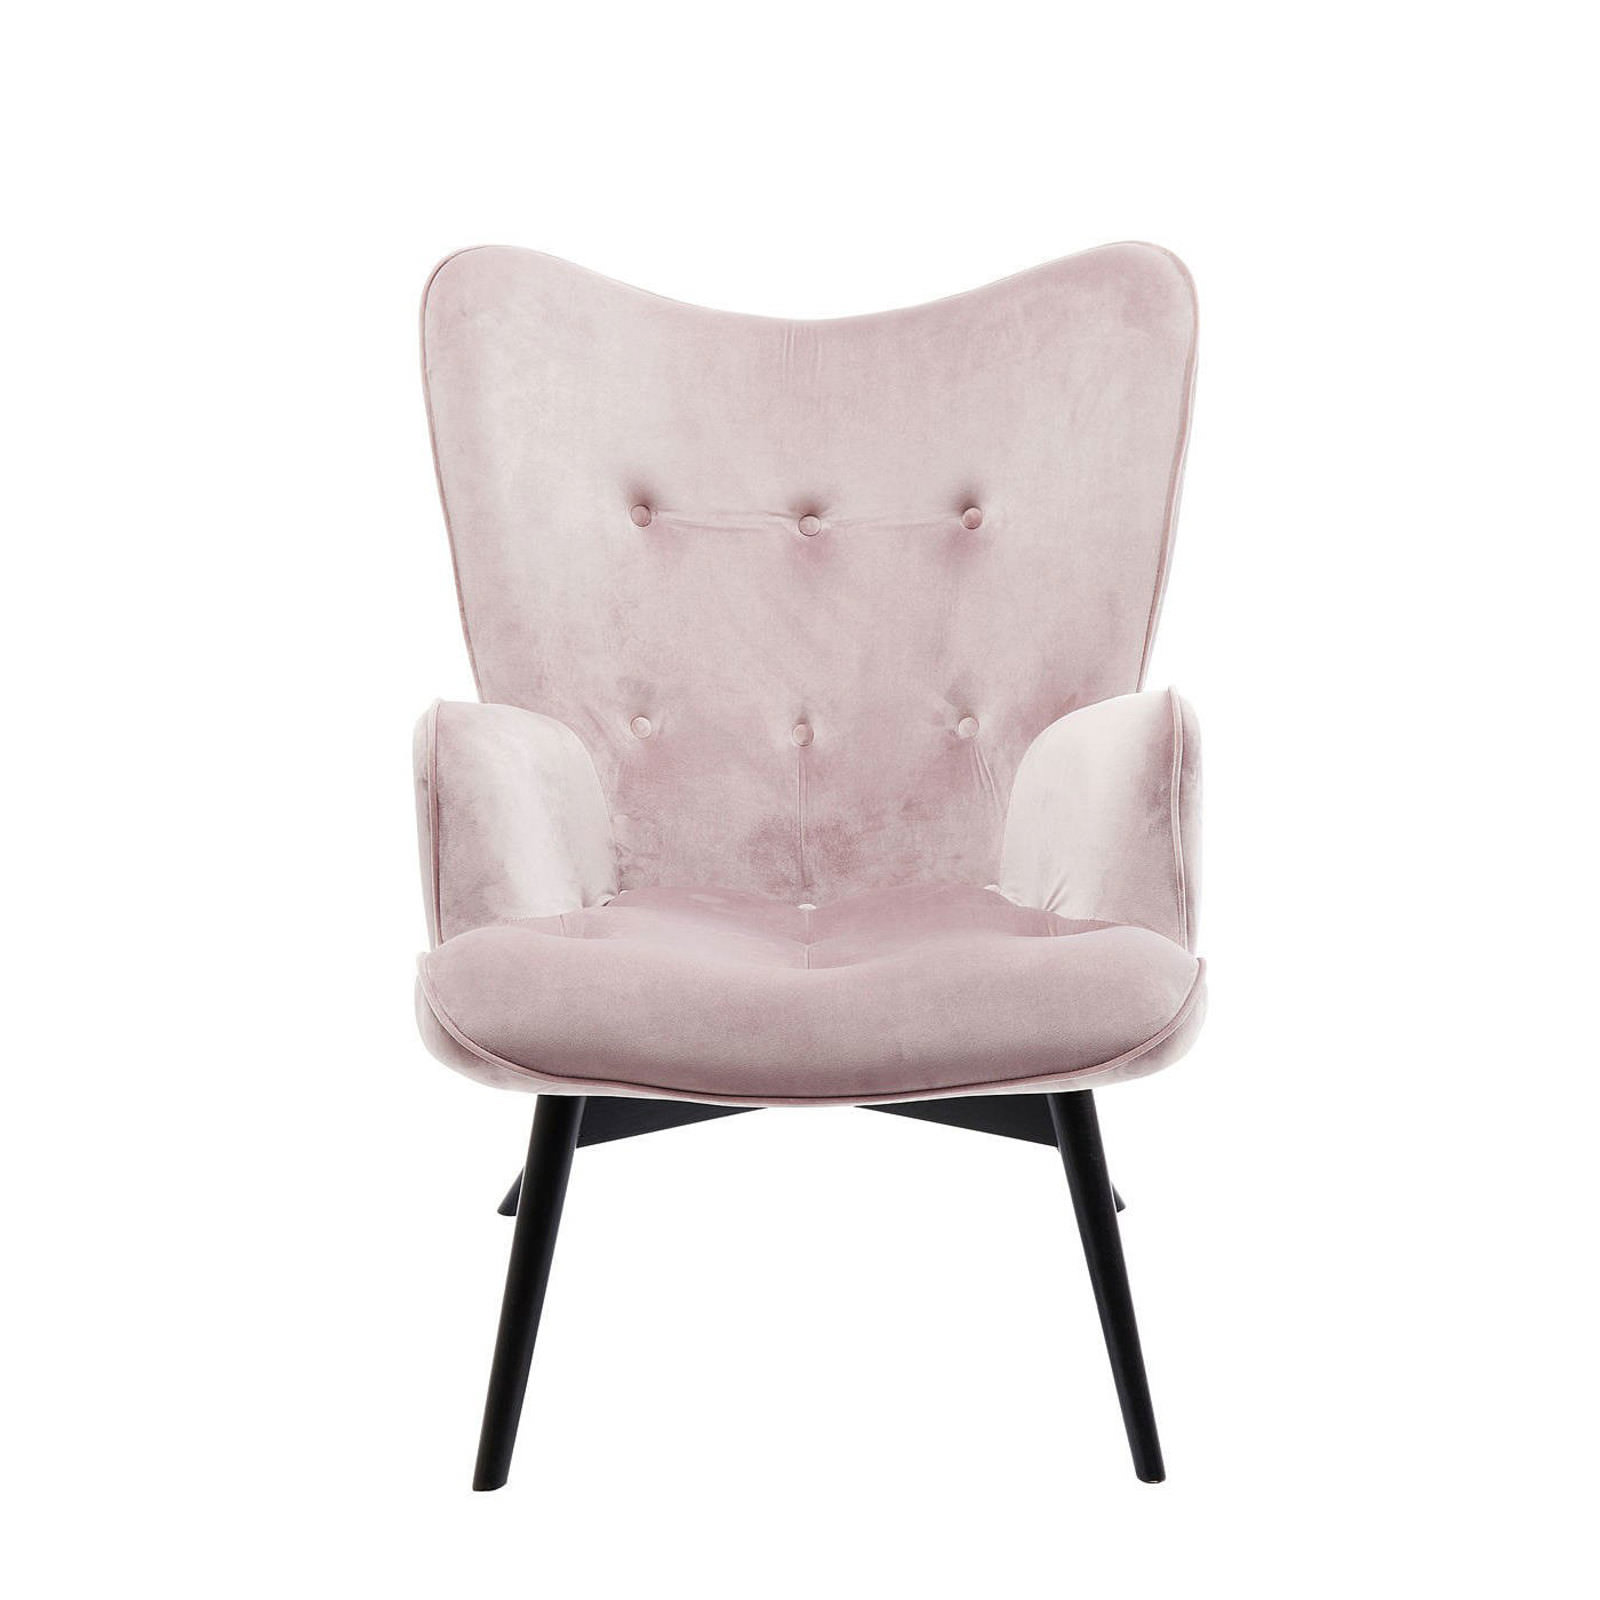 Kare Sessel pink online entdecken   Knuffmann   Ihr Möbelhaus